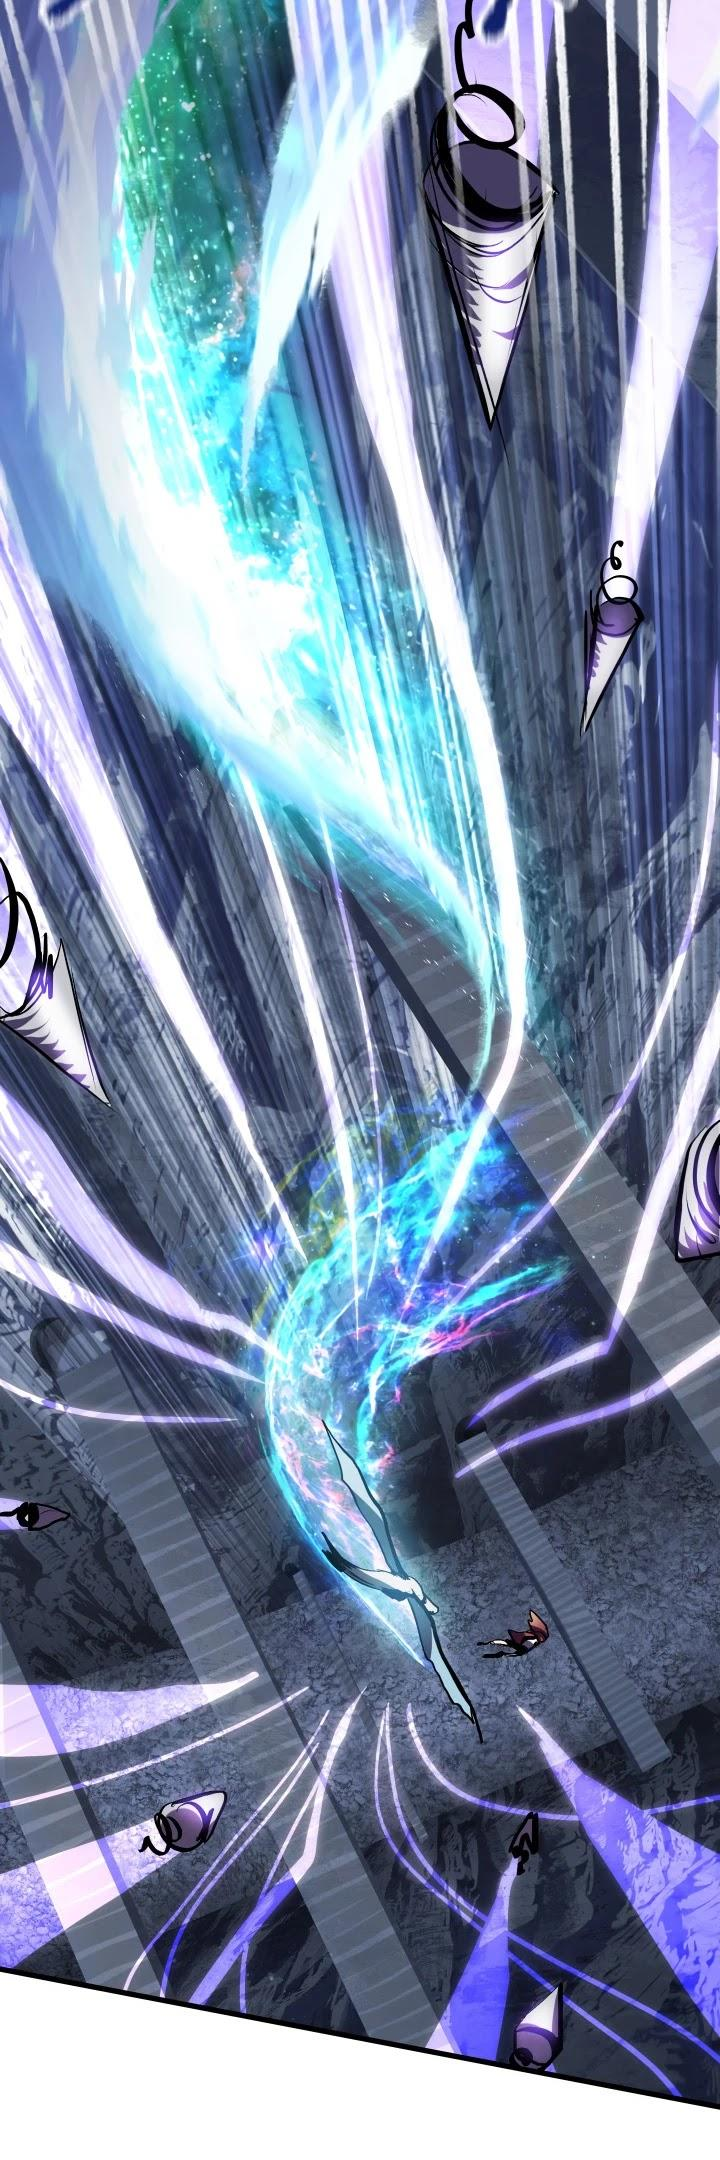 Survival Story Of A Sword King In A Fantasy World Chapter 66 page 48 - Mangakakalots.com